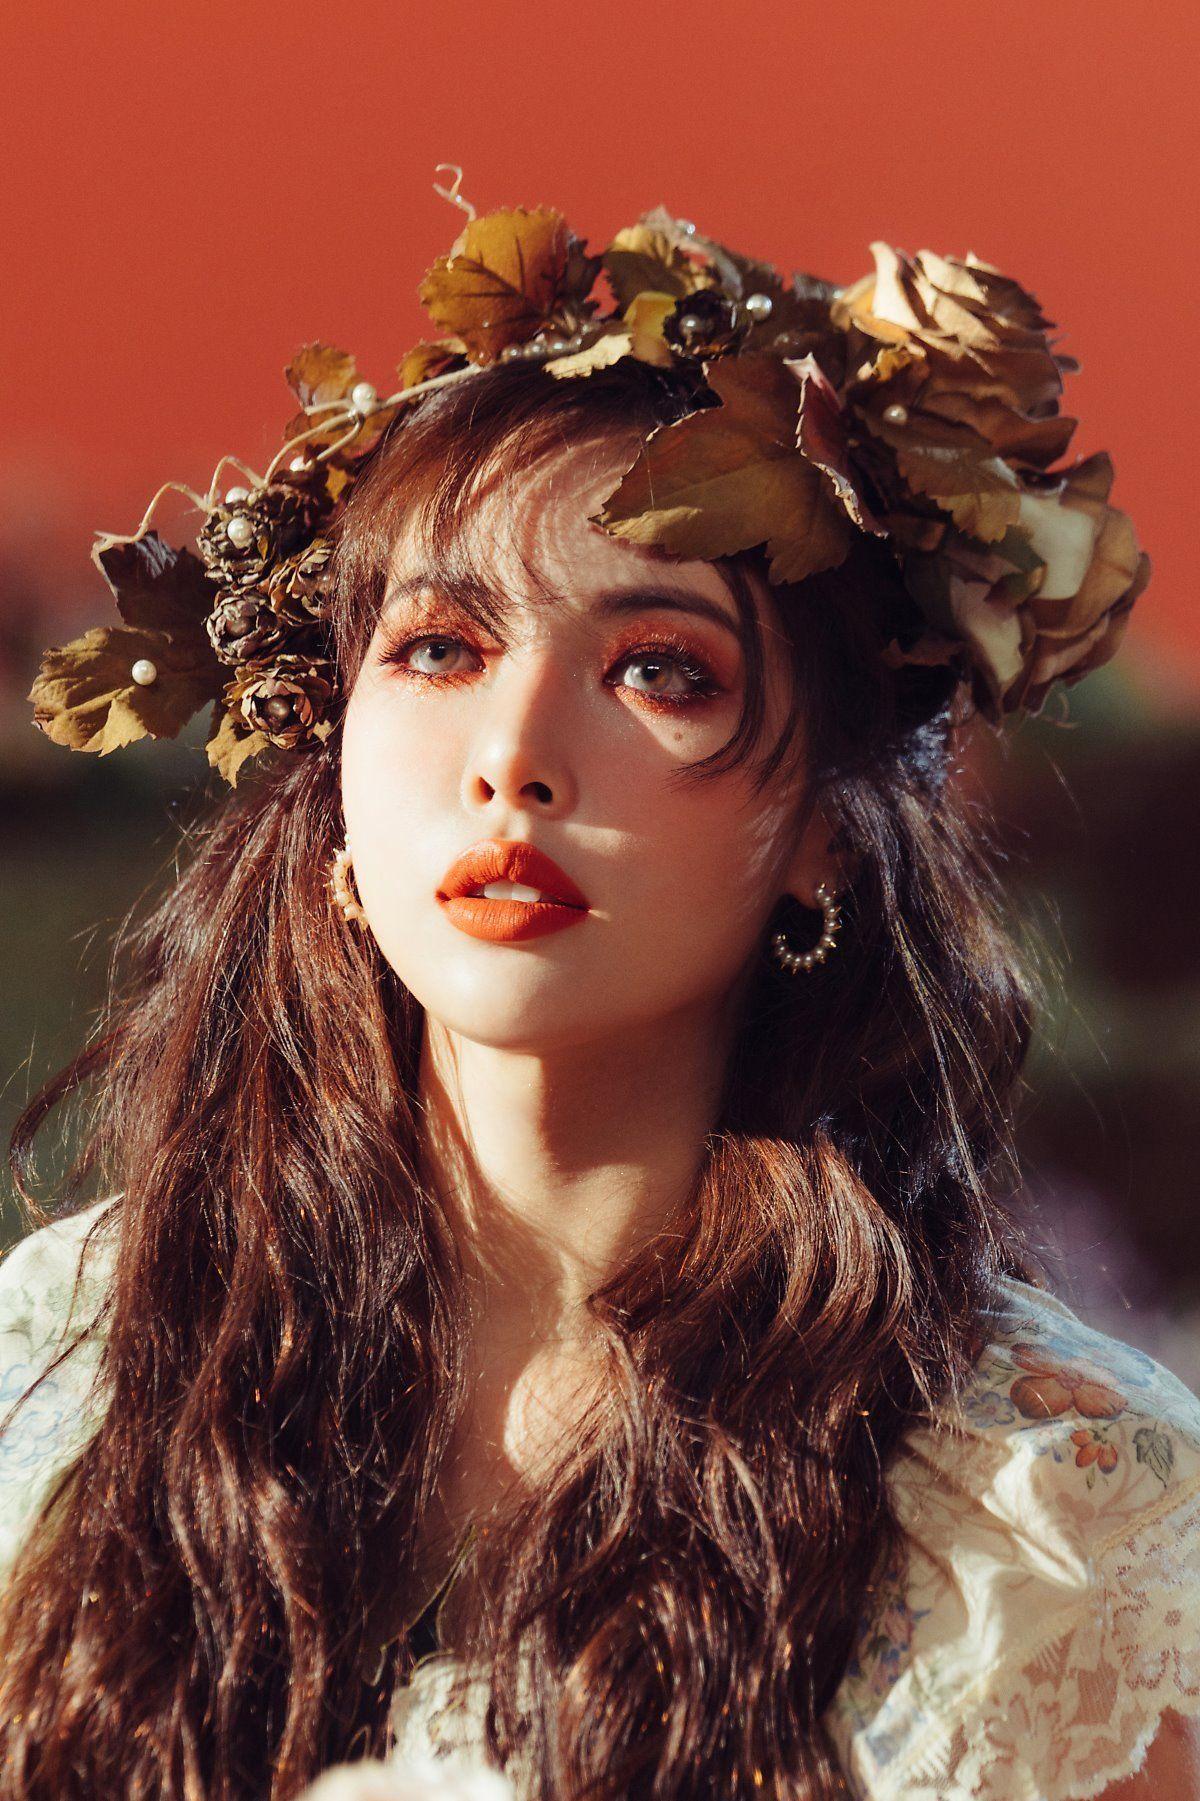 ' on in 2020 Flower shower, Hyuna kim, Kpop aesthetic